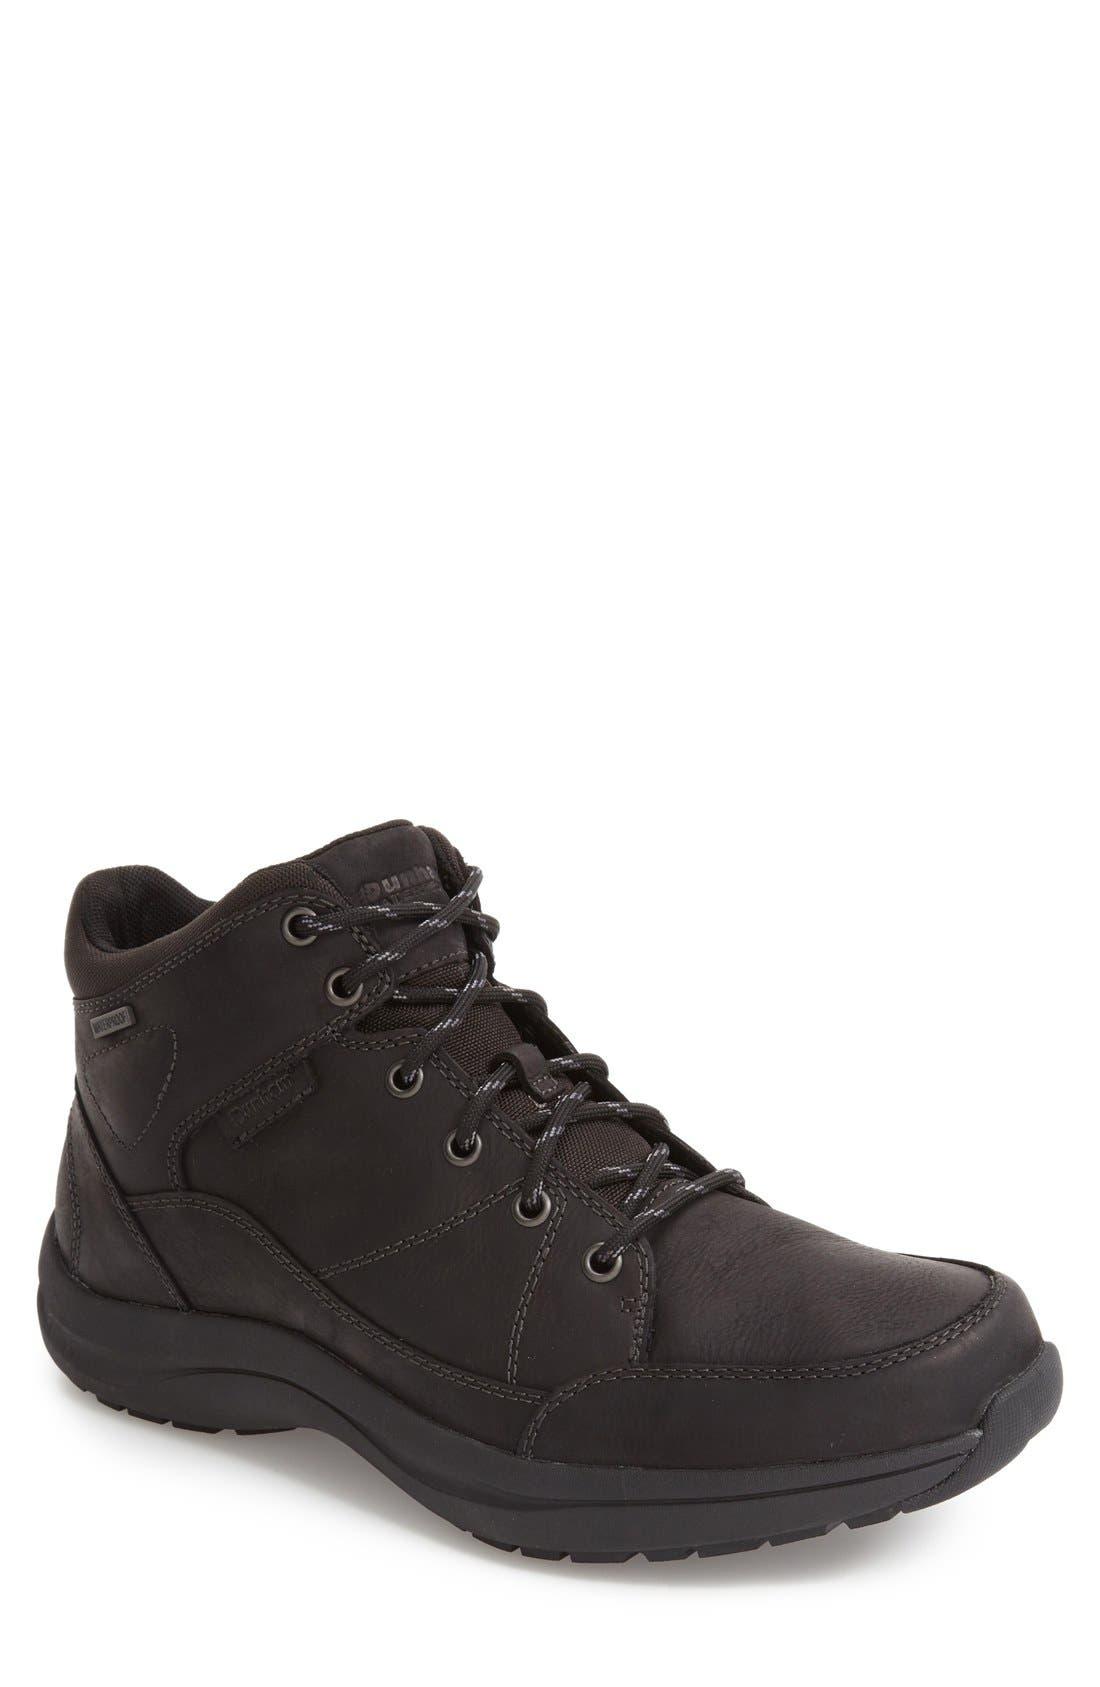 DUNHAM Simon-Dun Waterproof Boot, Main, color, BLACK LEATHER